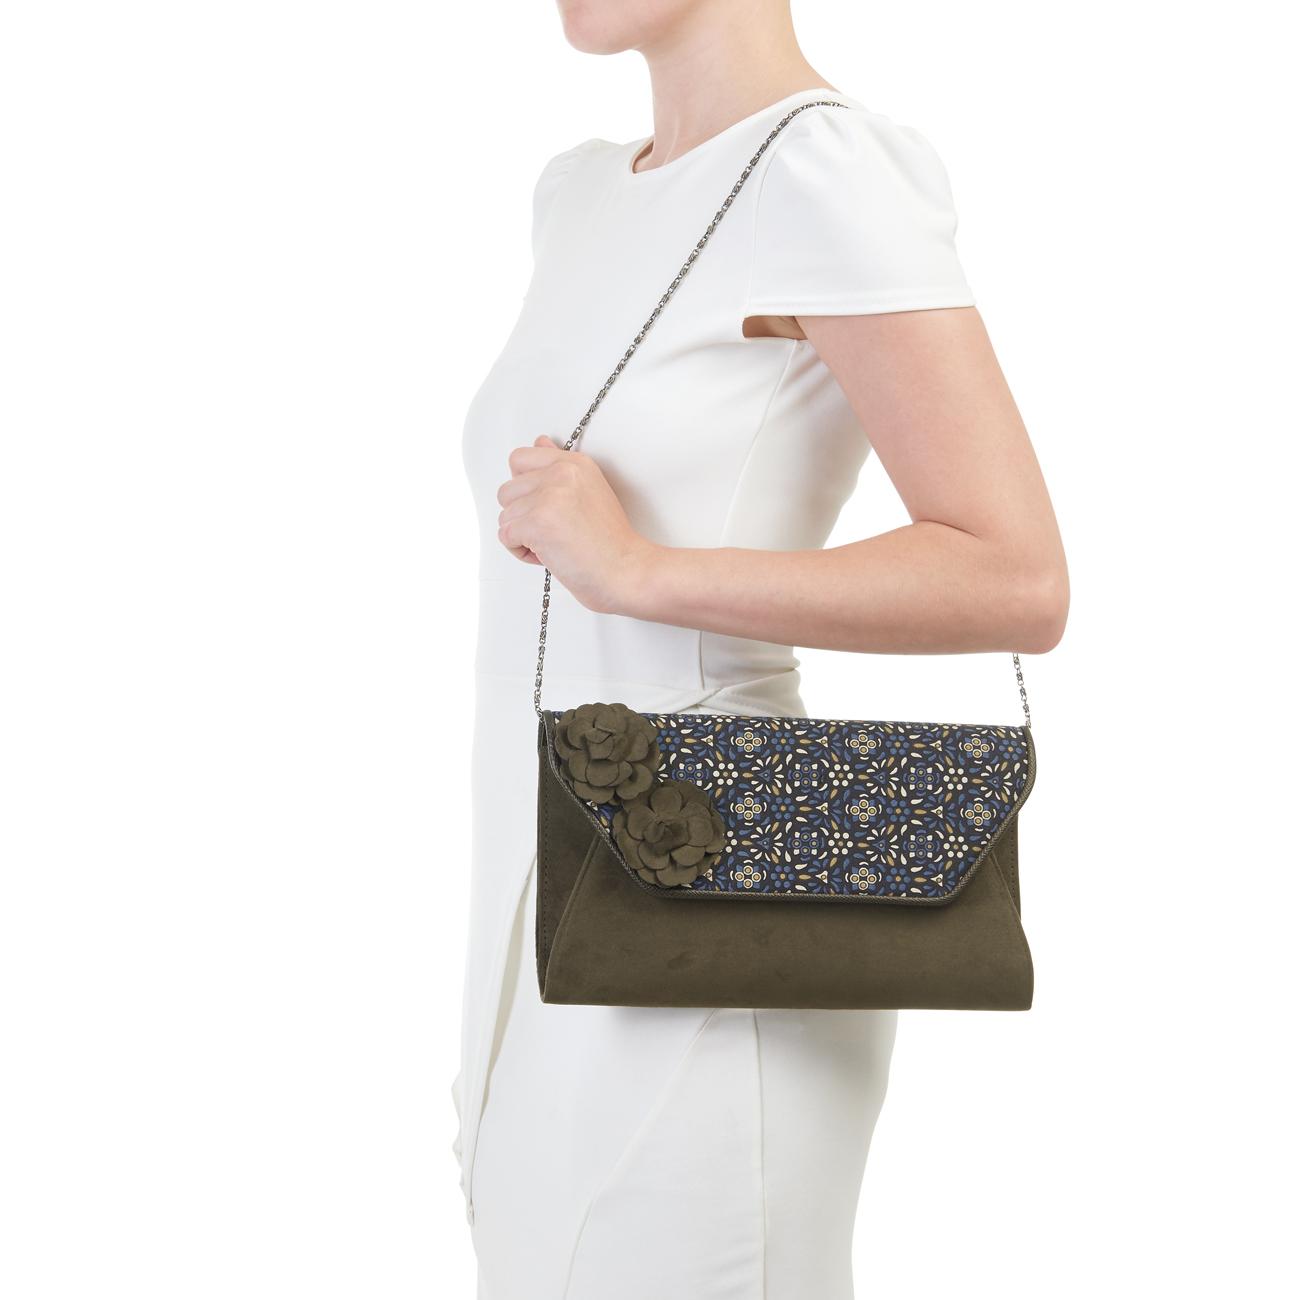 Ruby Shoo Hannah Mary Jane Shoes /& Matching Capri Bag Sz 3-9 Olive Black